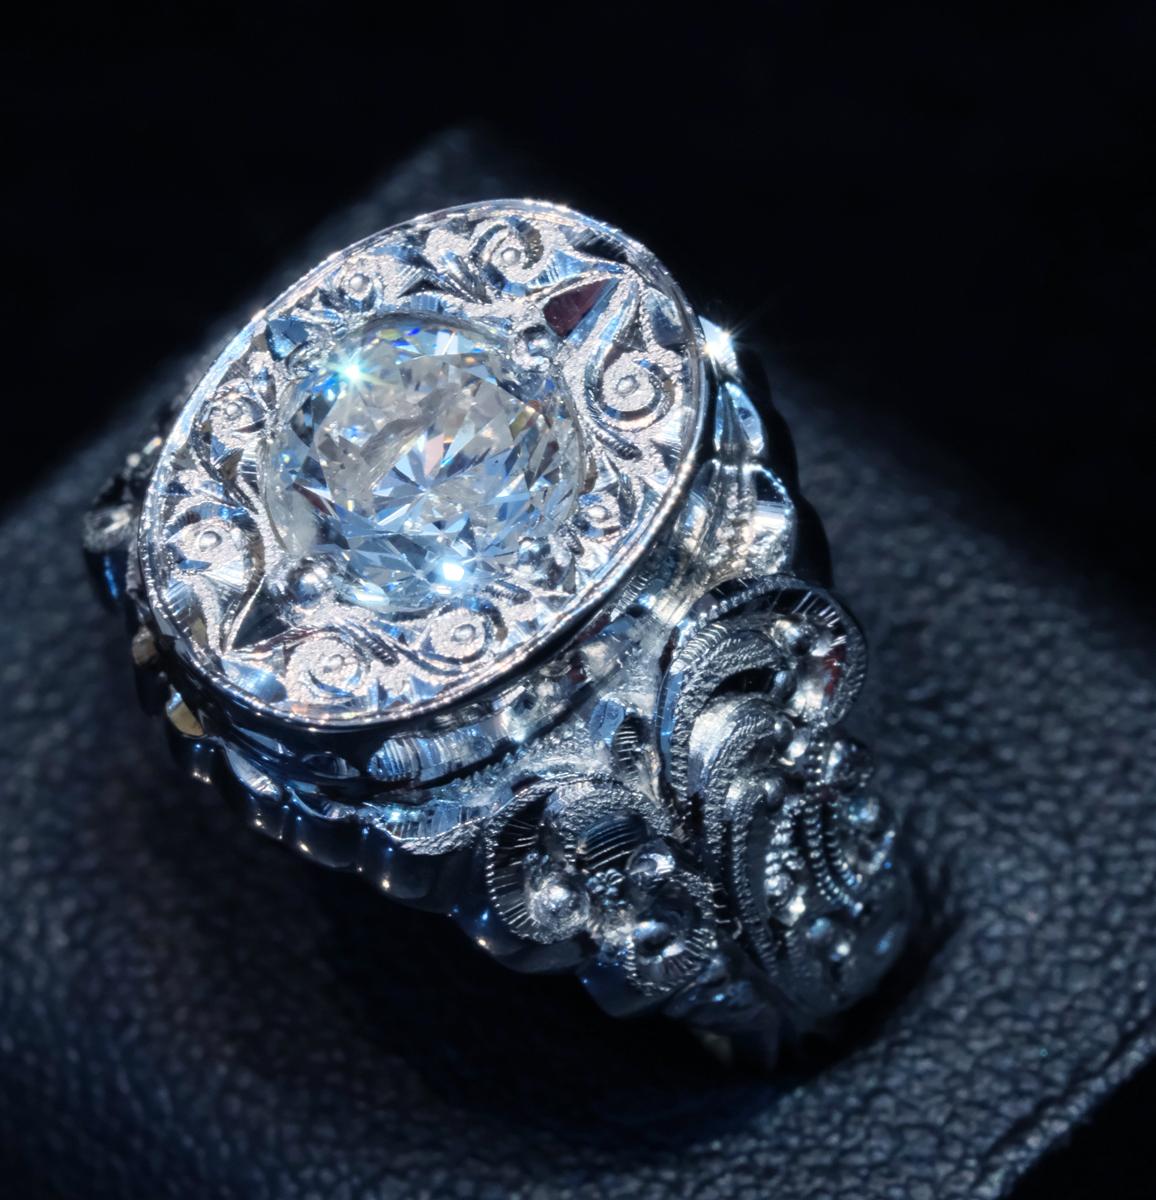 F2328【手創彫金】美しい天然大粒ダイヤモンド1.50ct 最高級Pt900無垢セレブリティメンズリング サイズ19 重量26.49g 縦幅16.6mm_画像1